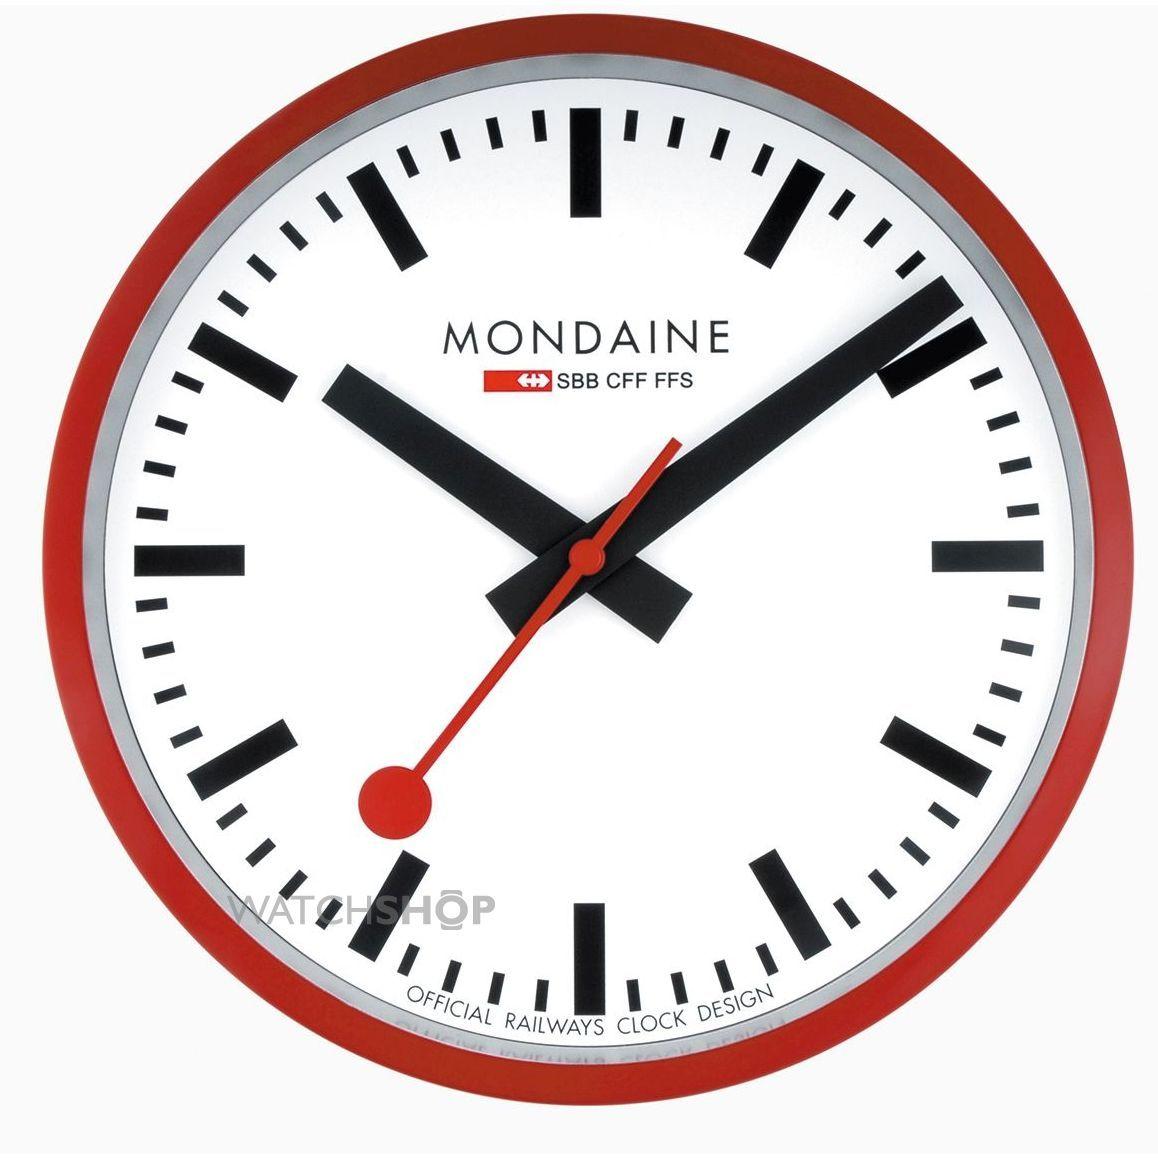 Mondaine Swiss Railways Wall Clock A990 Clock 11sbc Mondaine Clock Mondaine Wall Clock Red Wall Clock